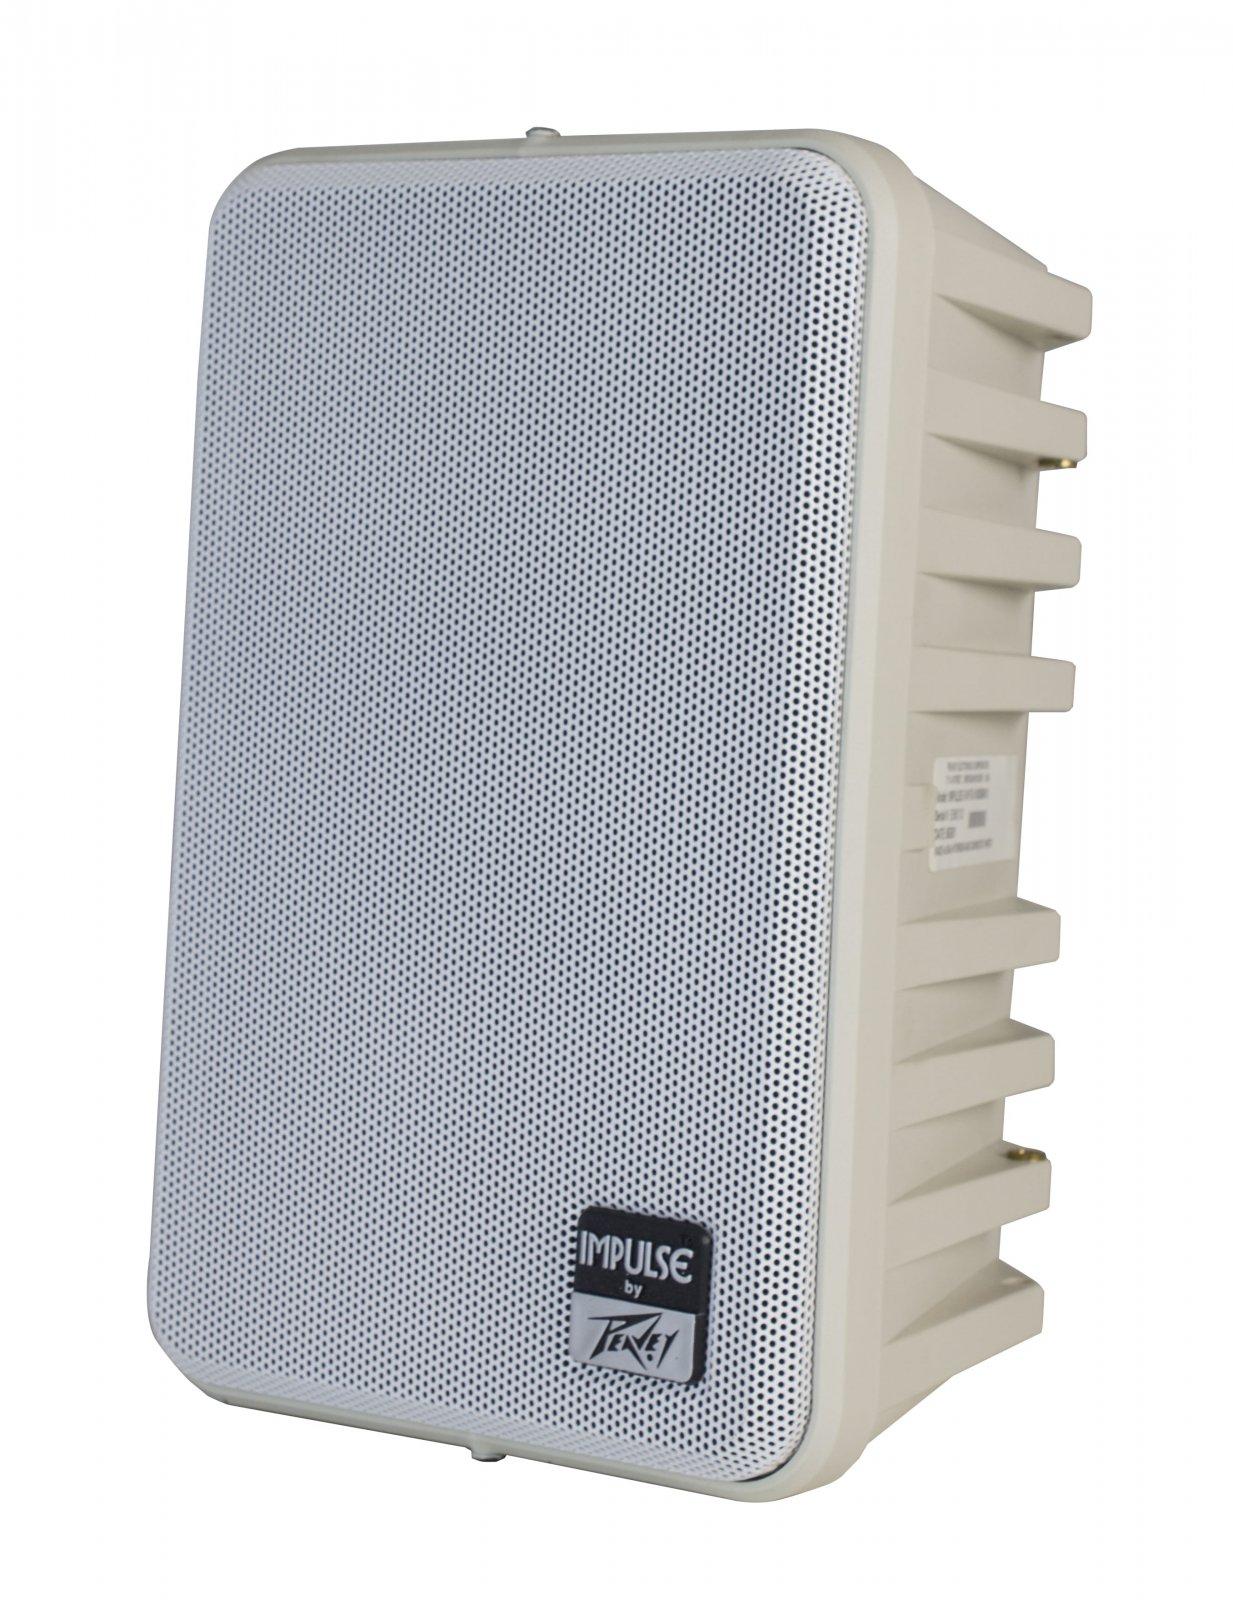 Peavey Impulse 6T Mini 2-Way Speaker White